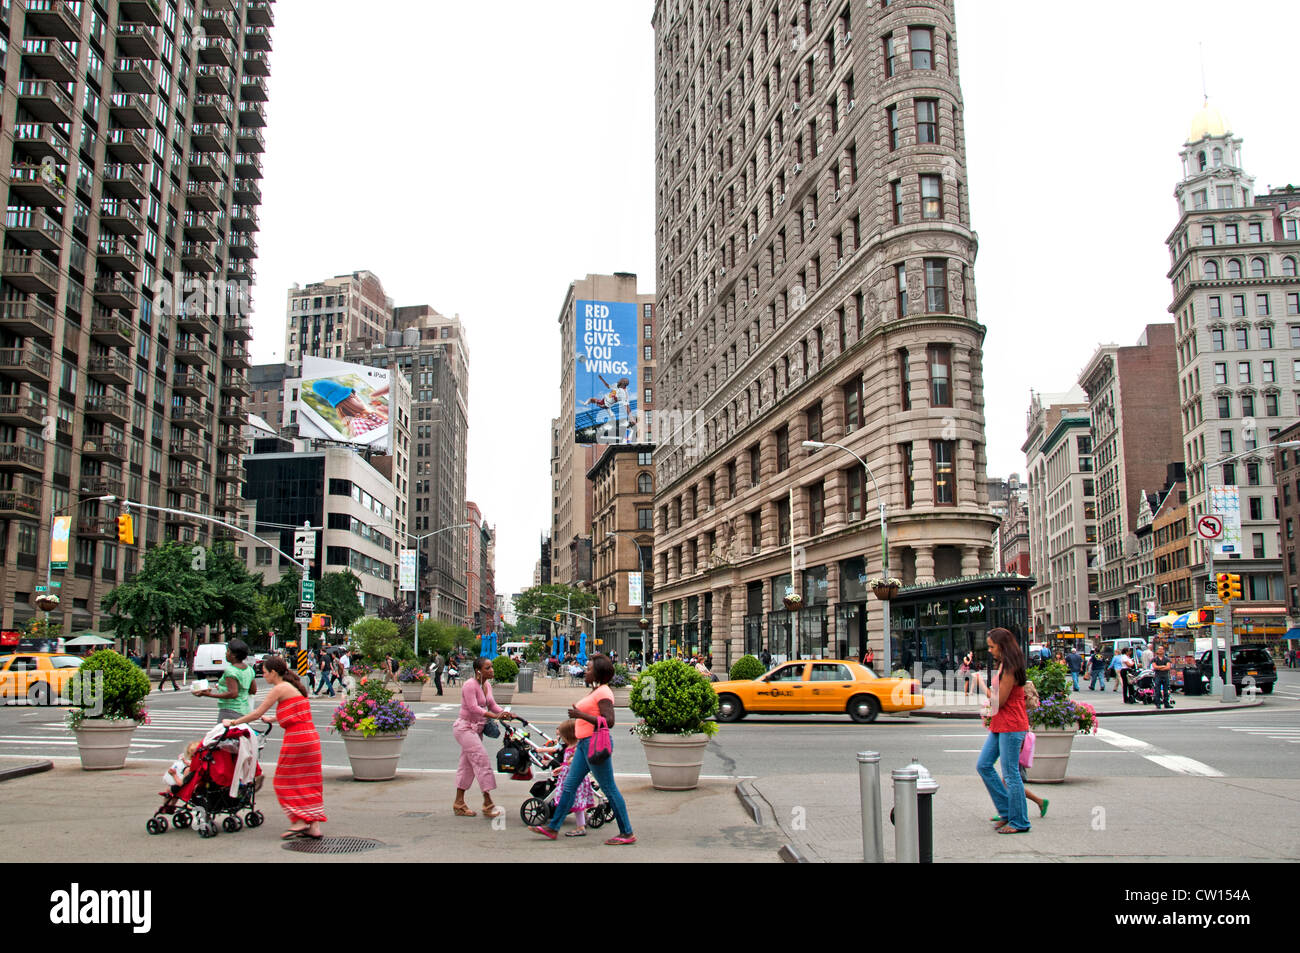 Flatiron Building District Broadway 5th Avenue Manhattan New York City United States of America - Stock Image